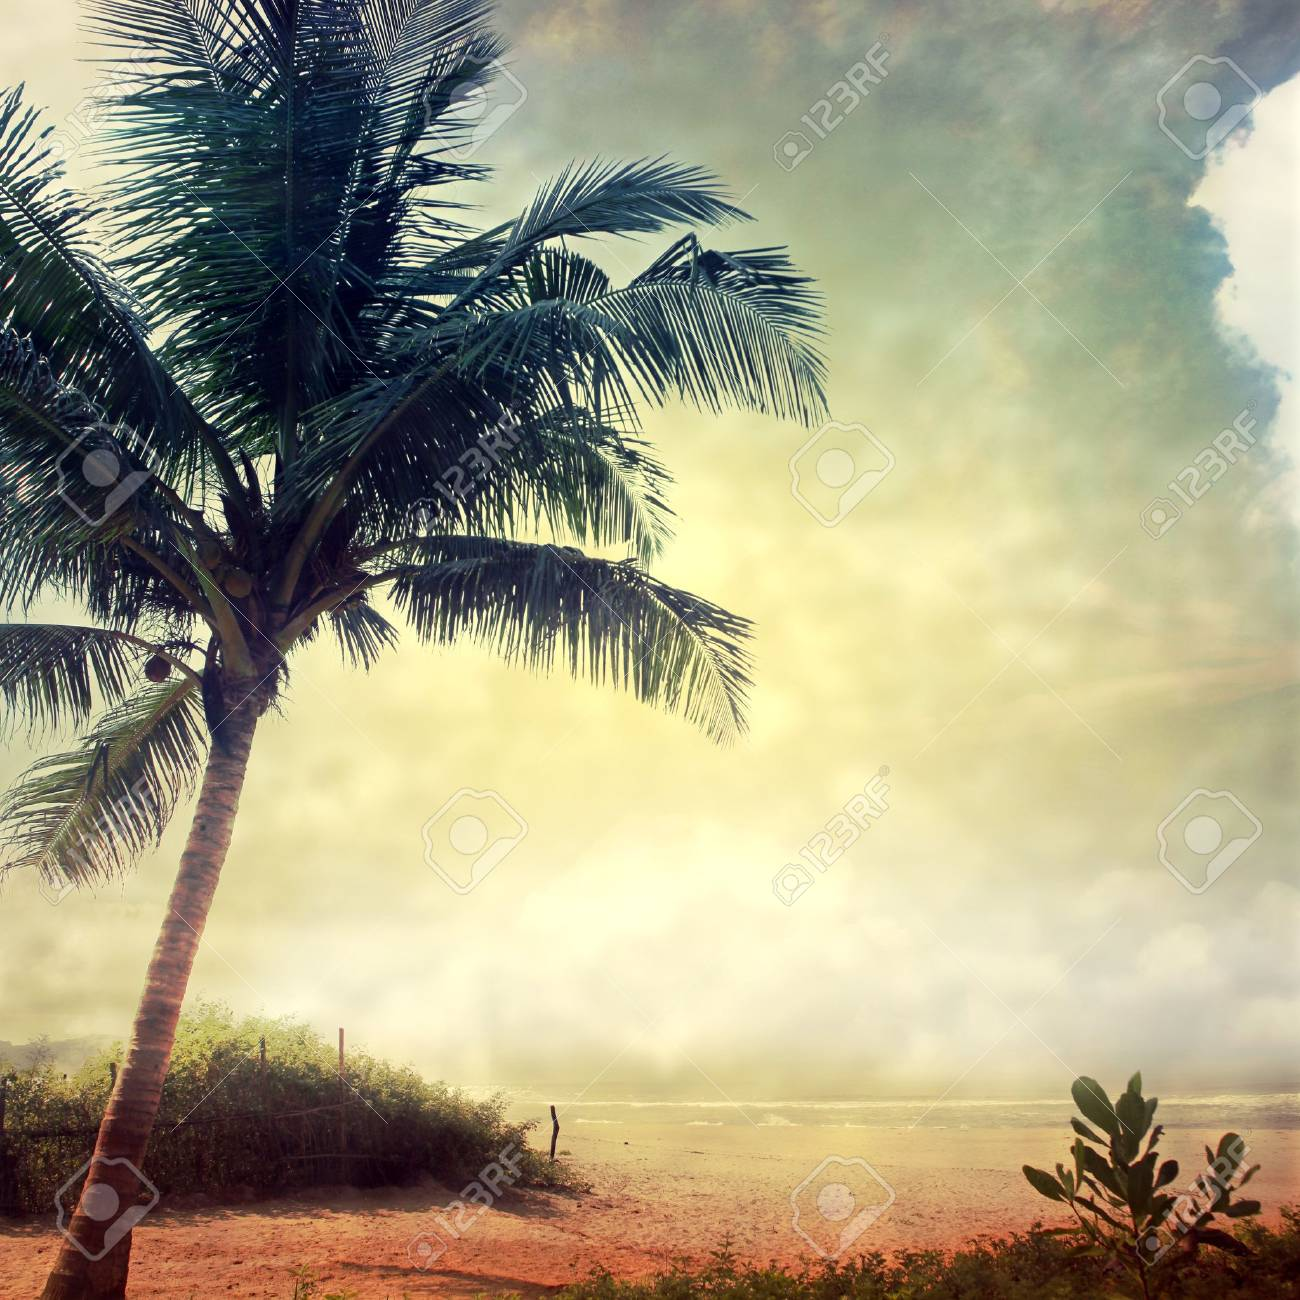 grunge palm background Stock Photo - 14788458